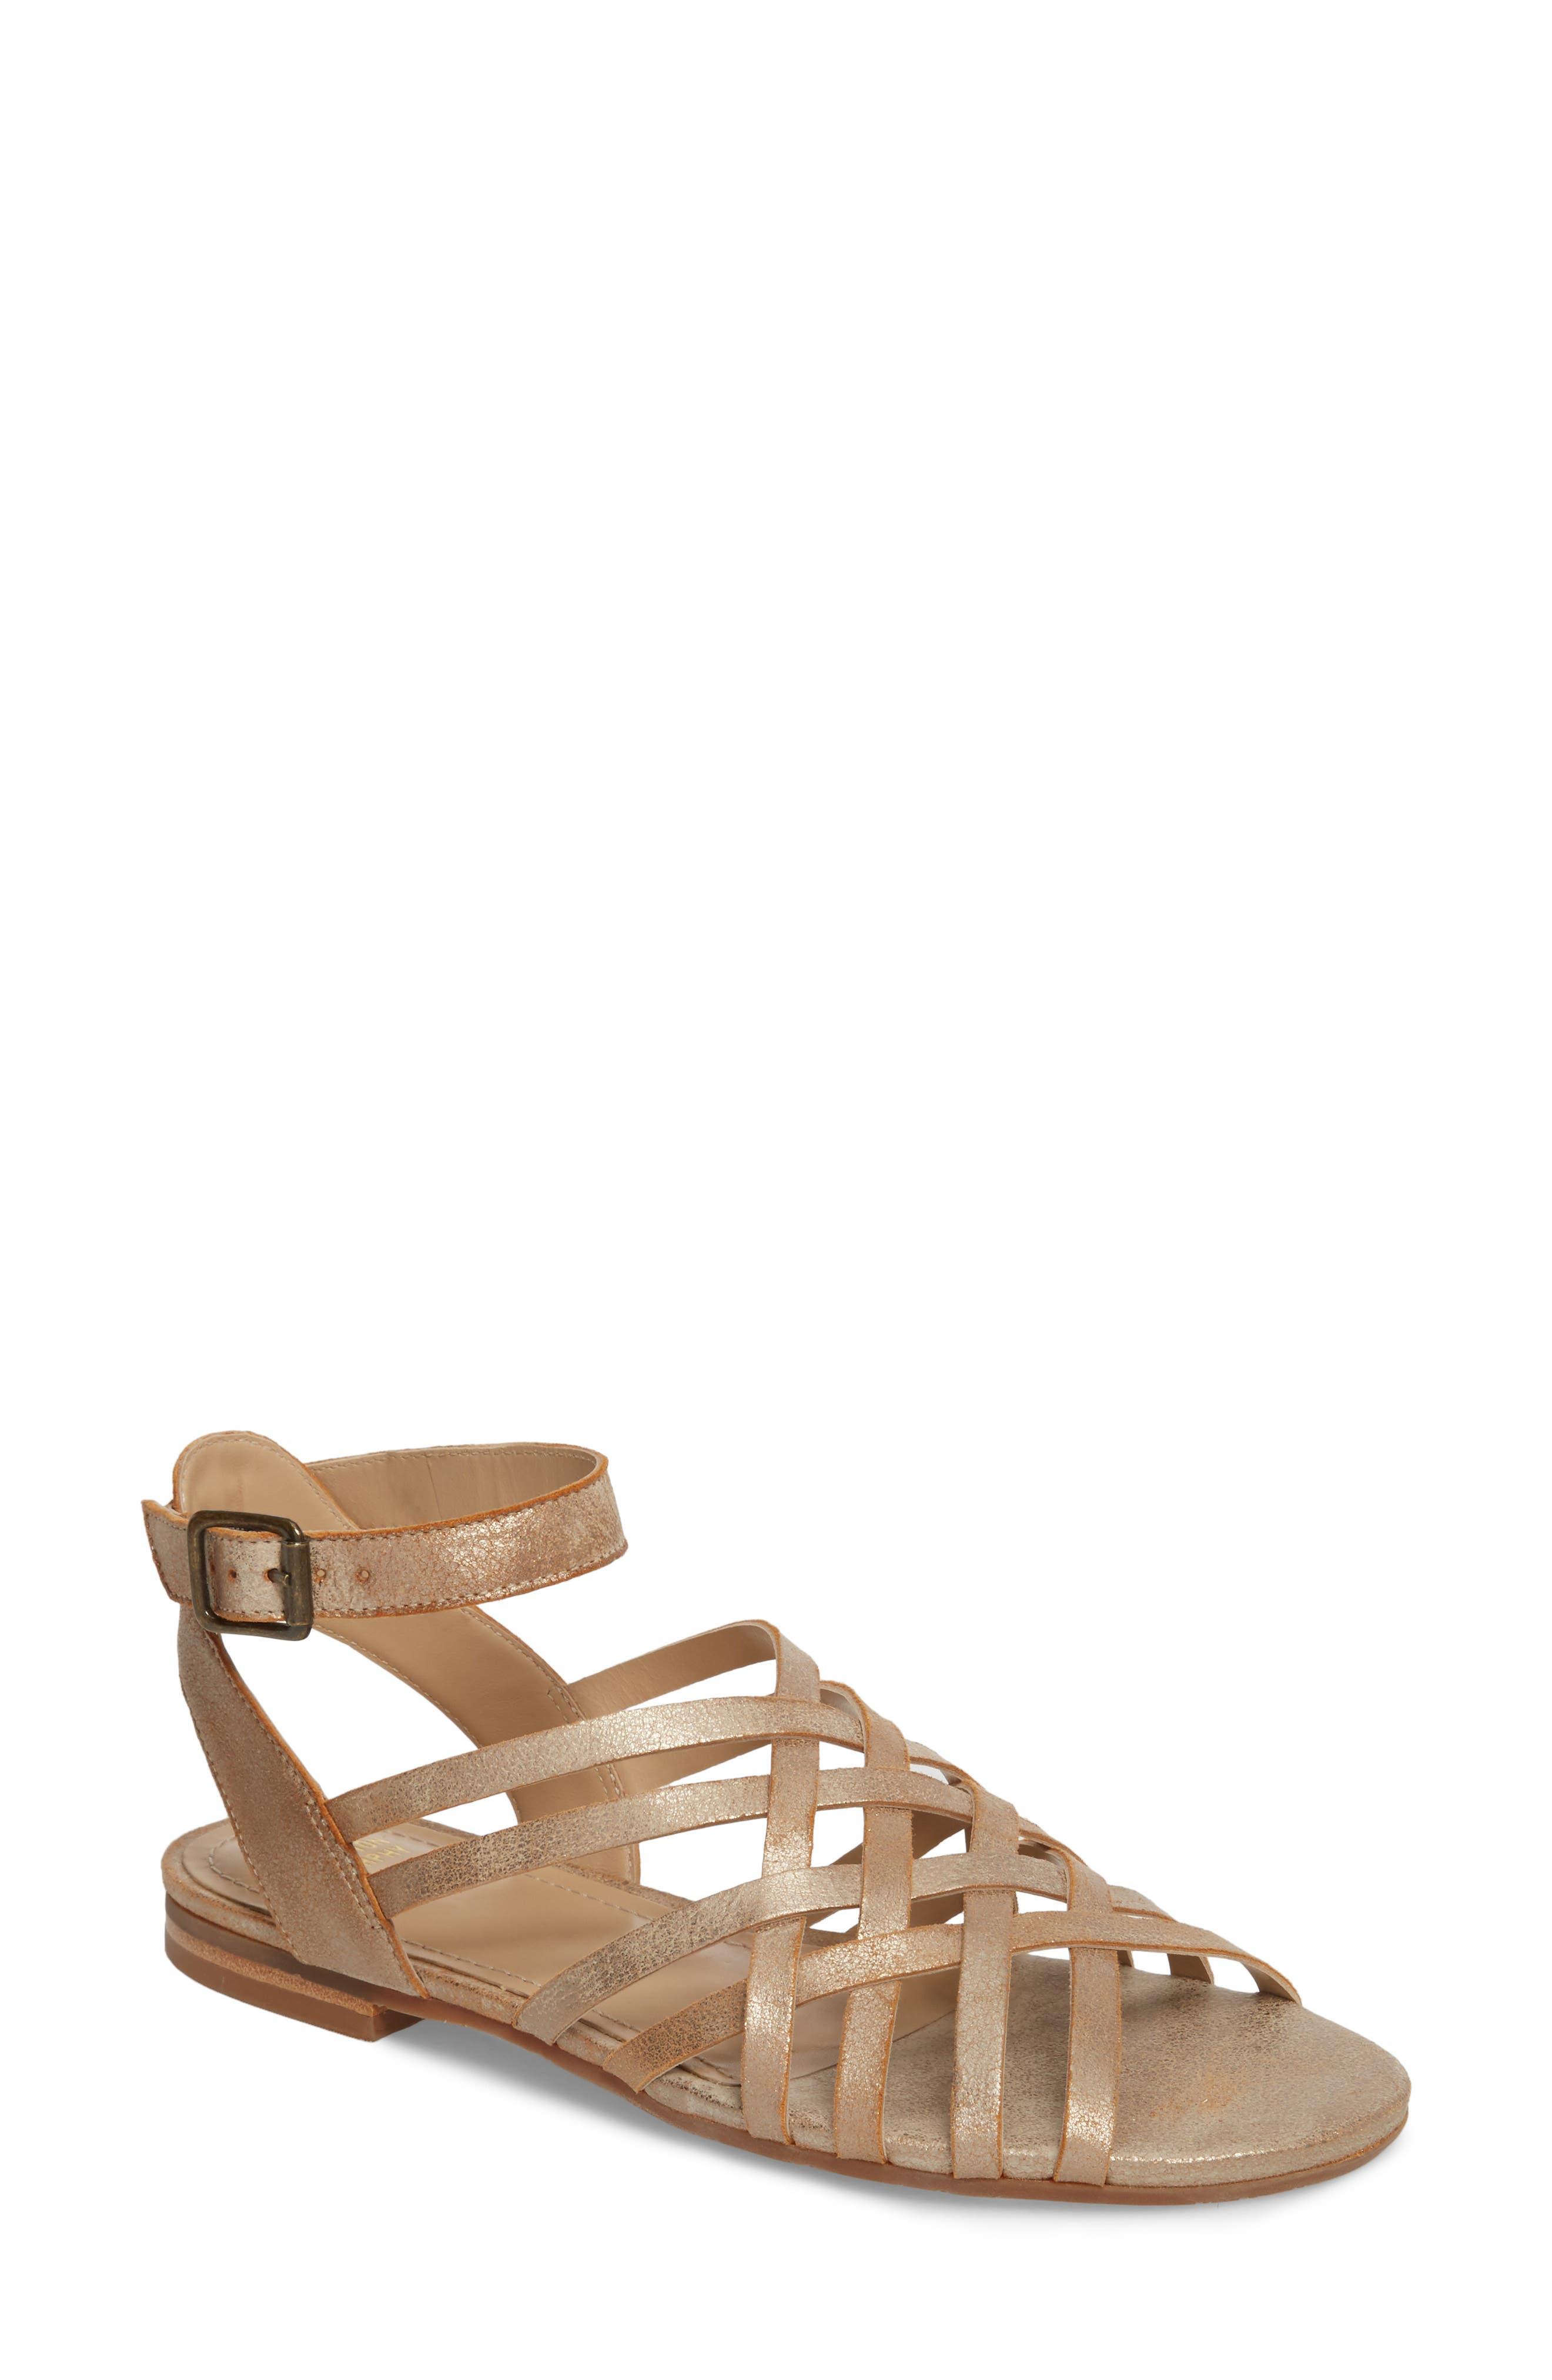 Hallie Sandal,                         Main,                         color, Copper Leather